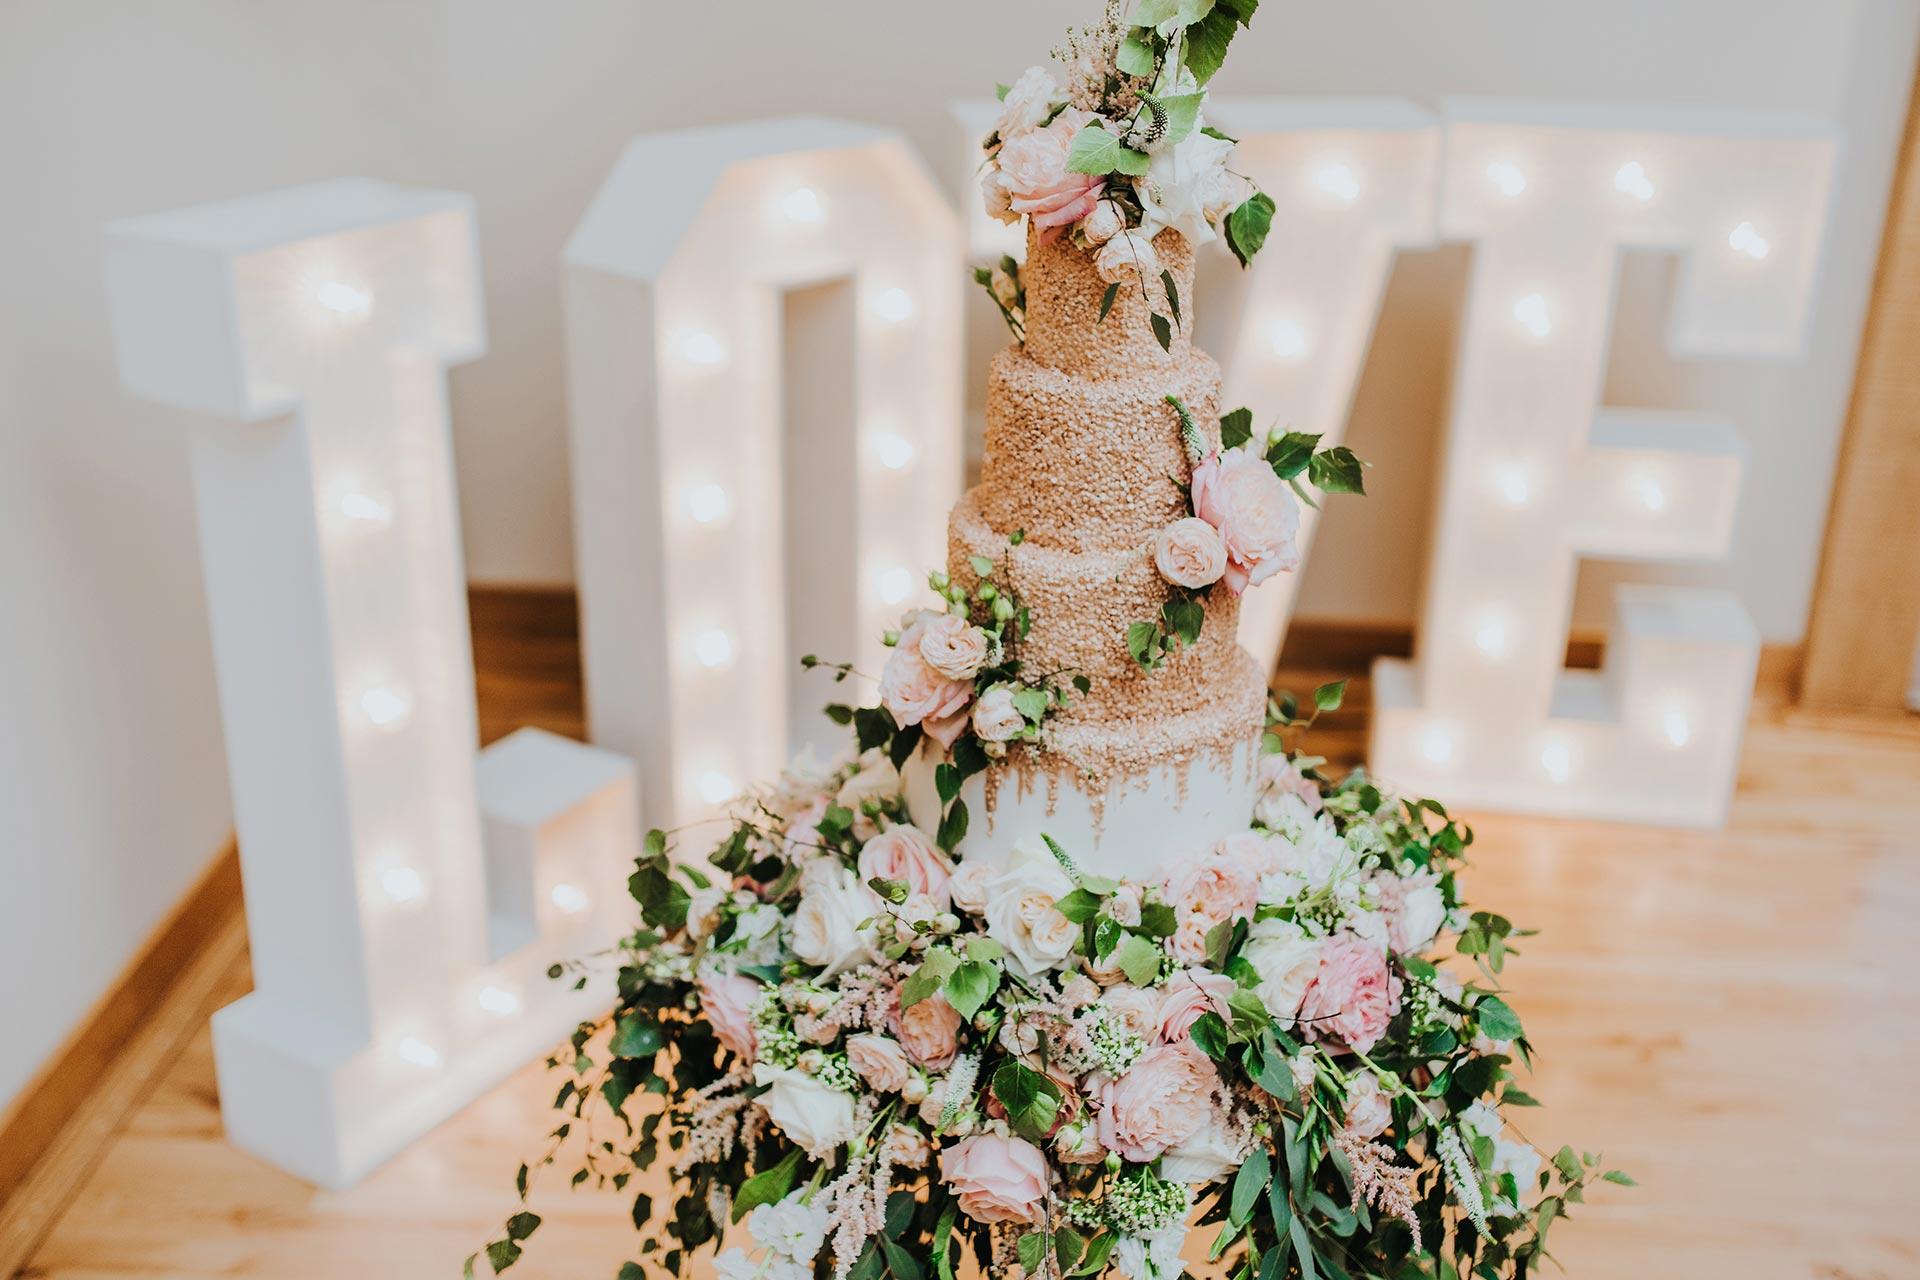 Wedding Cake Ideas For A Barn Wedding Bassmead Manor Barns